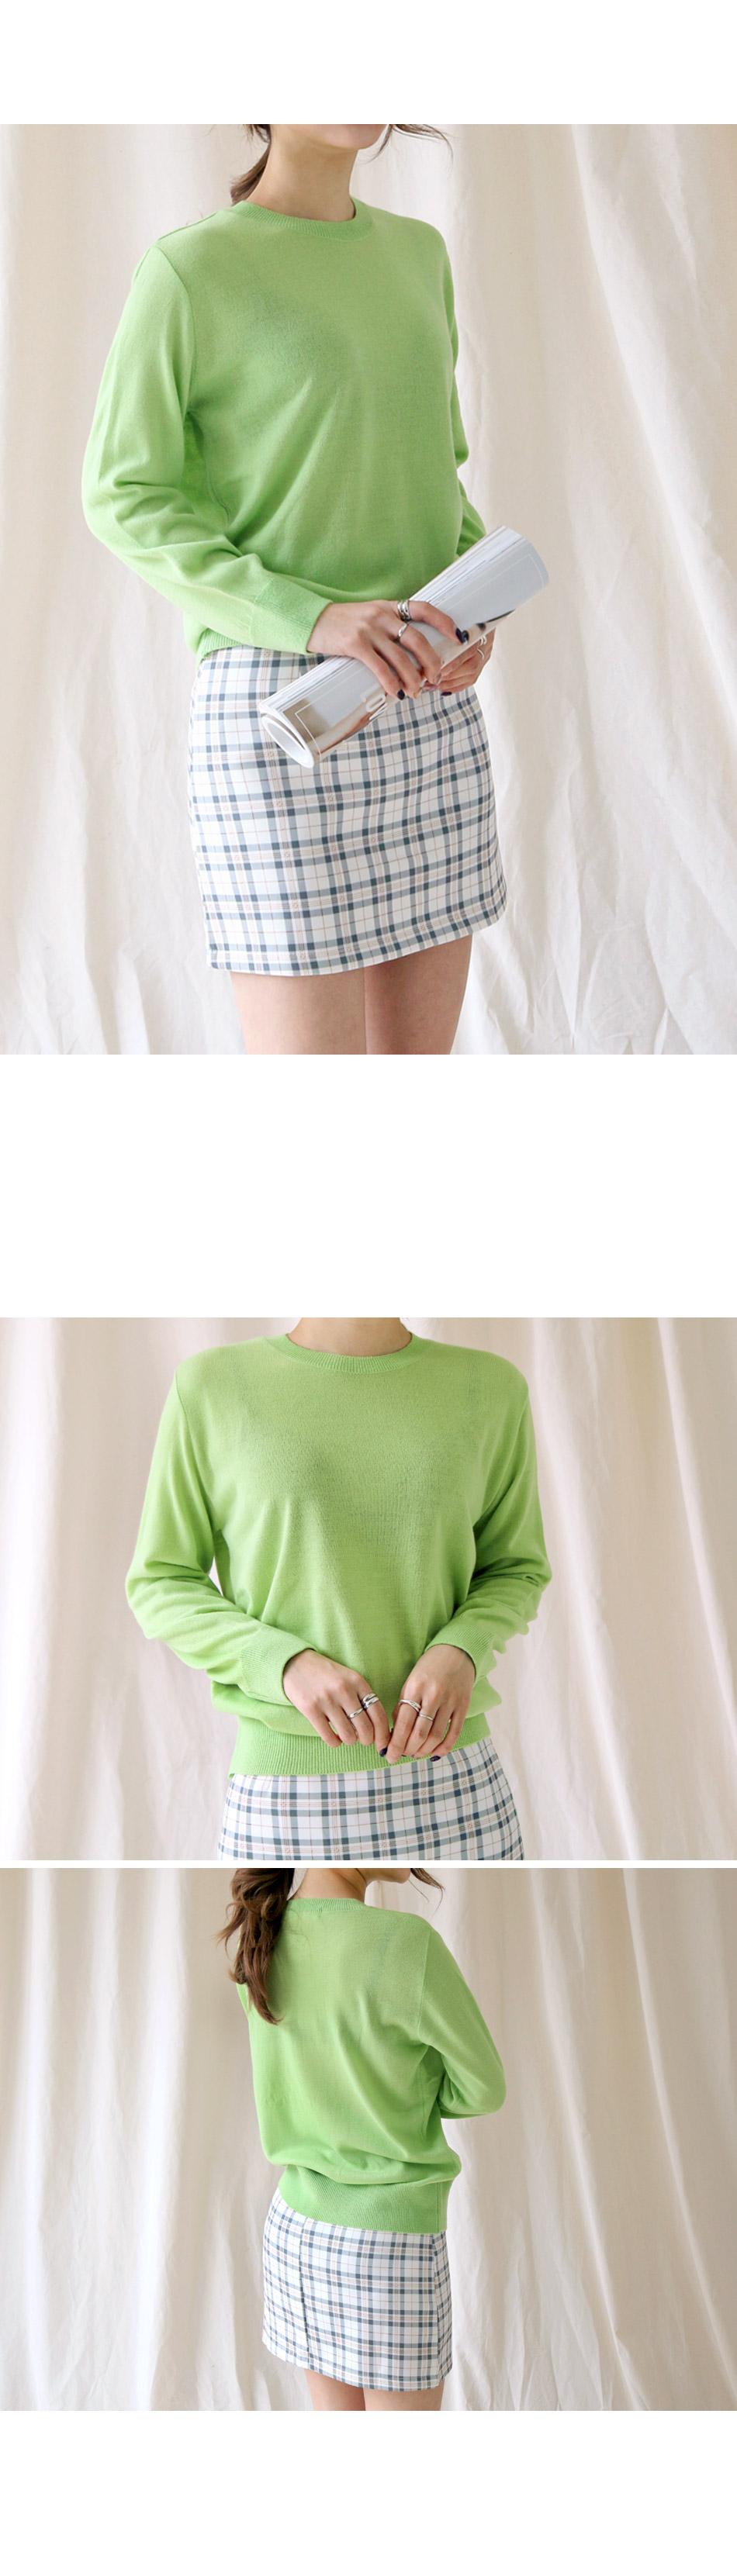 Vivid Round Neck Knit